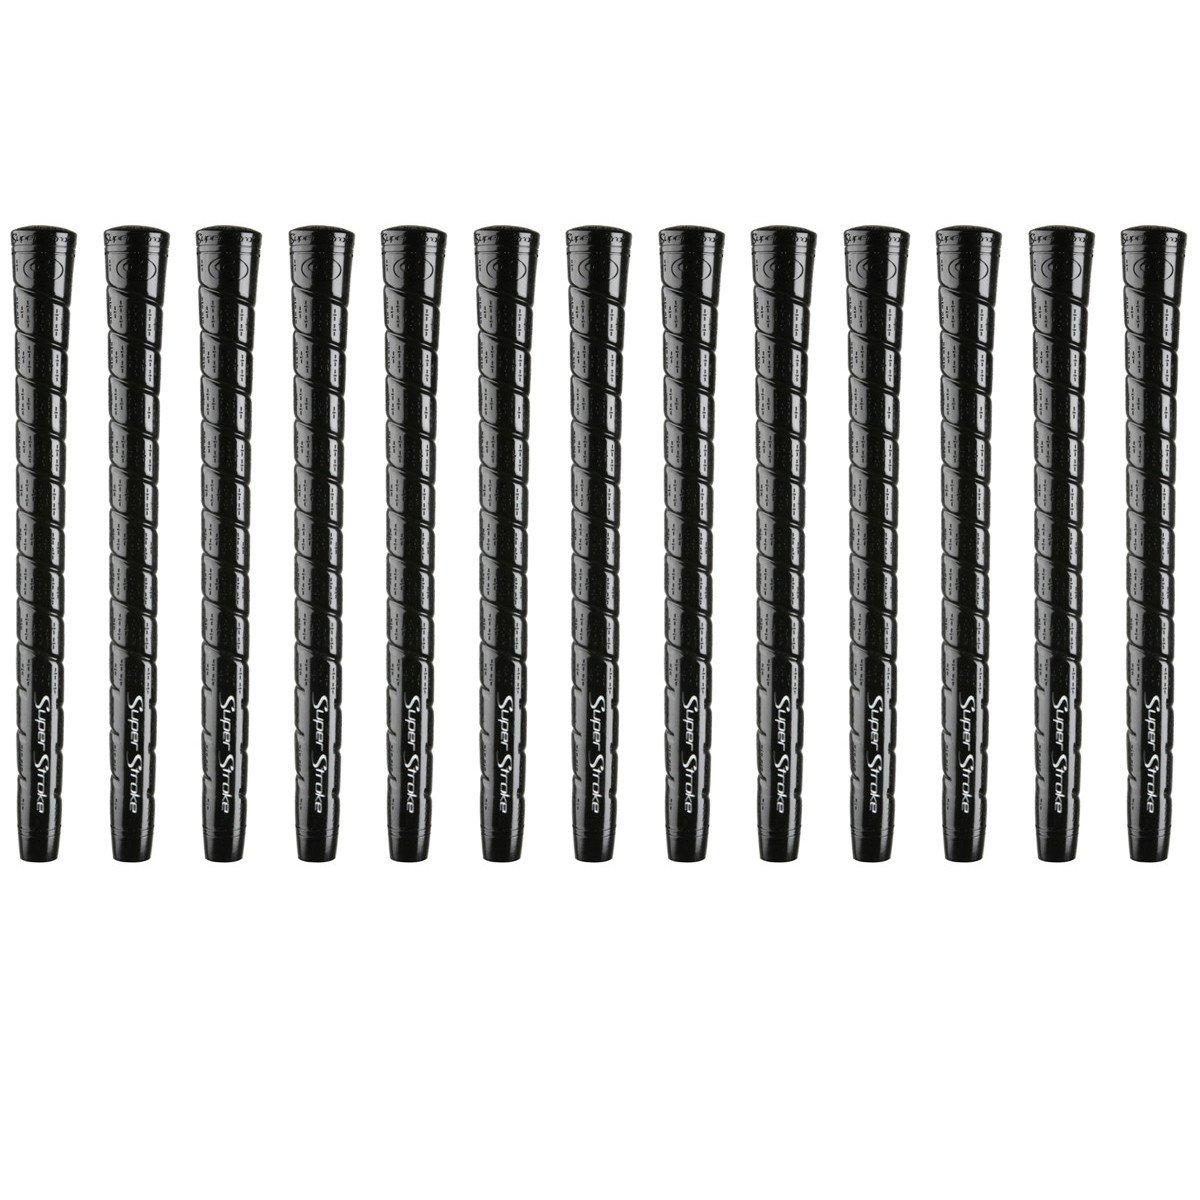 SuperStrokeソフトラップTC Midsizeブラック – 13 Pieceゴルフグリップバンドル B07CW38K3Y